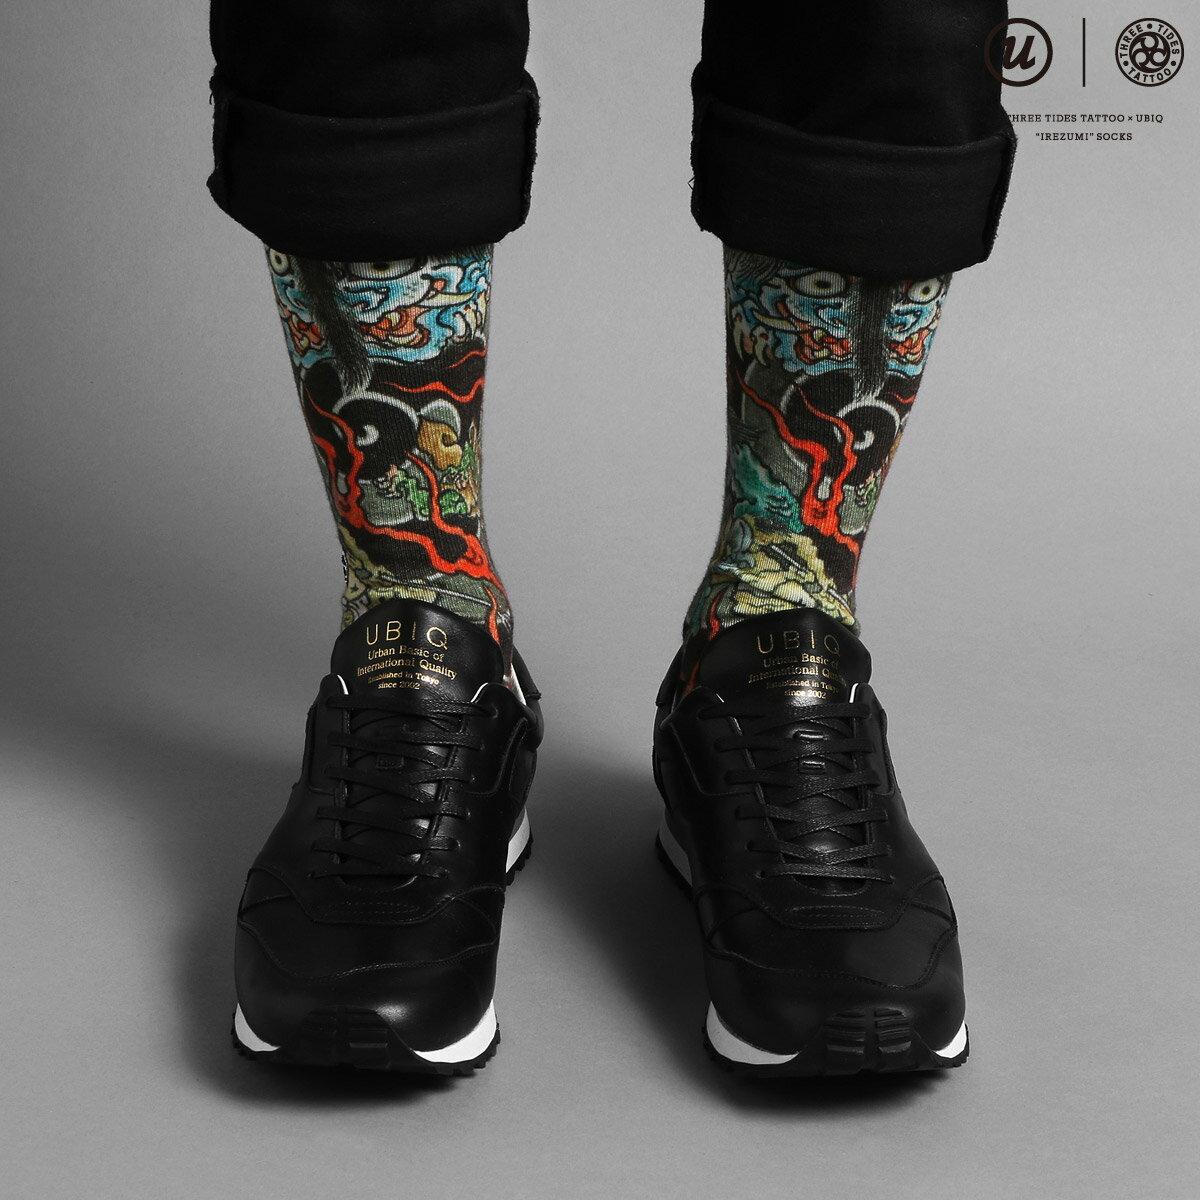 "UBIQ THREE TIDES TATTOO × UBIQ ""IREZUMI"" SOCKS (Youkai) Designed by Ganji (スリータイズタトゥー ユービック イレズミソックス (ヨウカイ) デザインド バイ ガンジー) (BLACK)【メンズ 靴下】17SS-I"